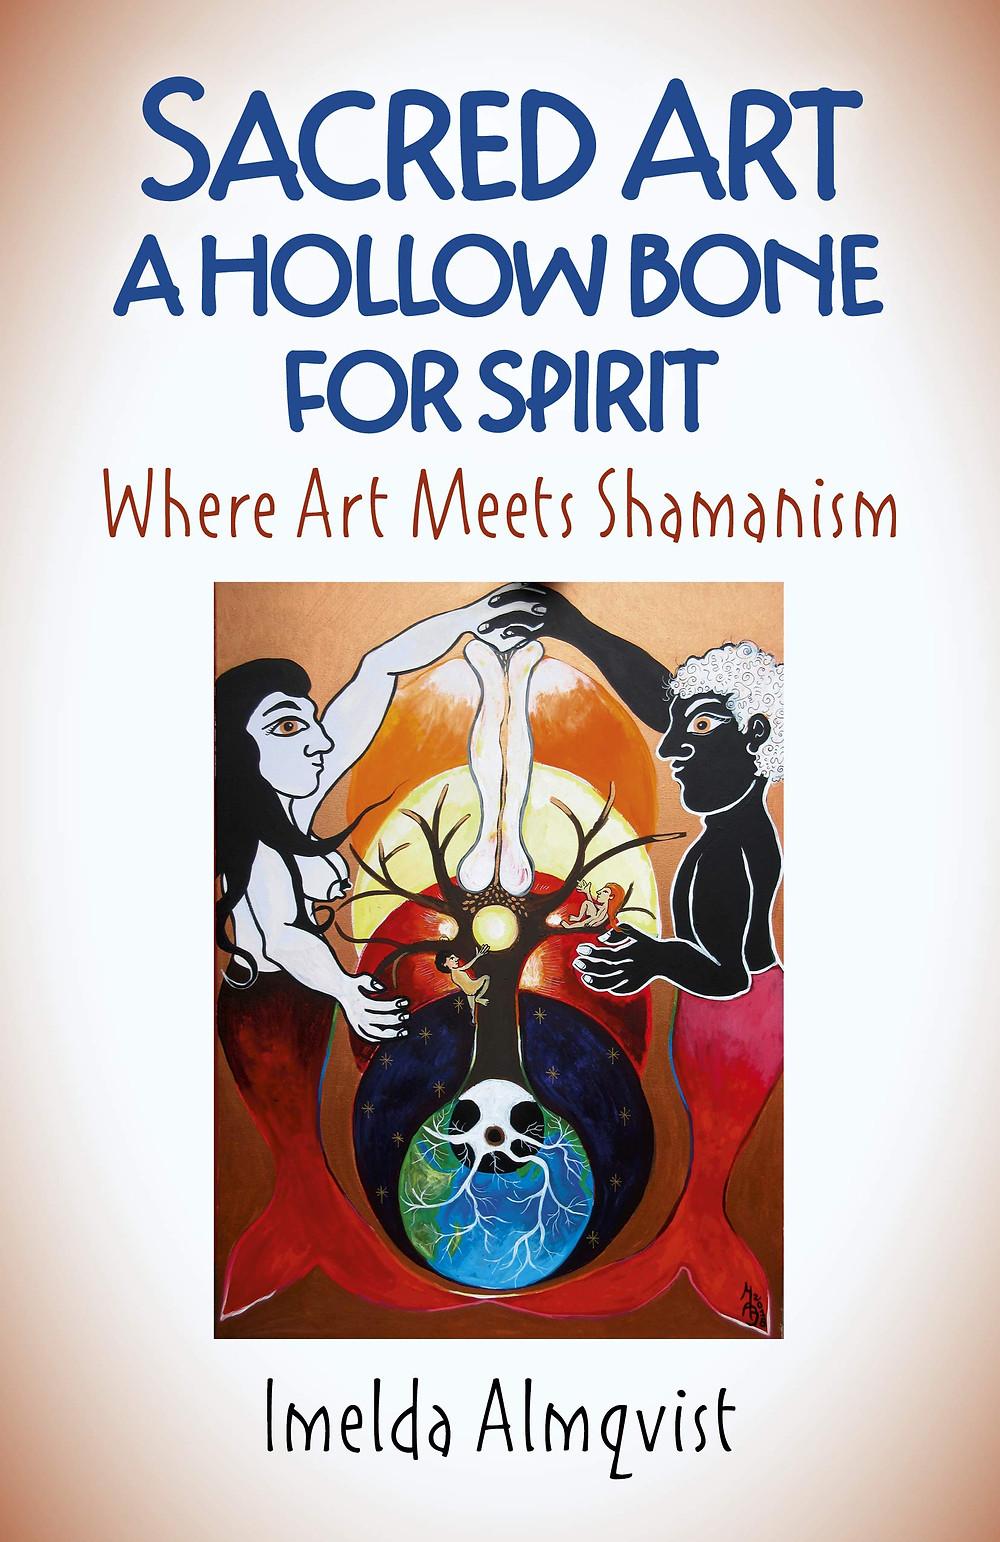 Sacred Art A Hollow Bone For Spirit Where Art Meets Shamanism - Book Review